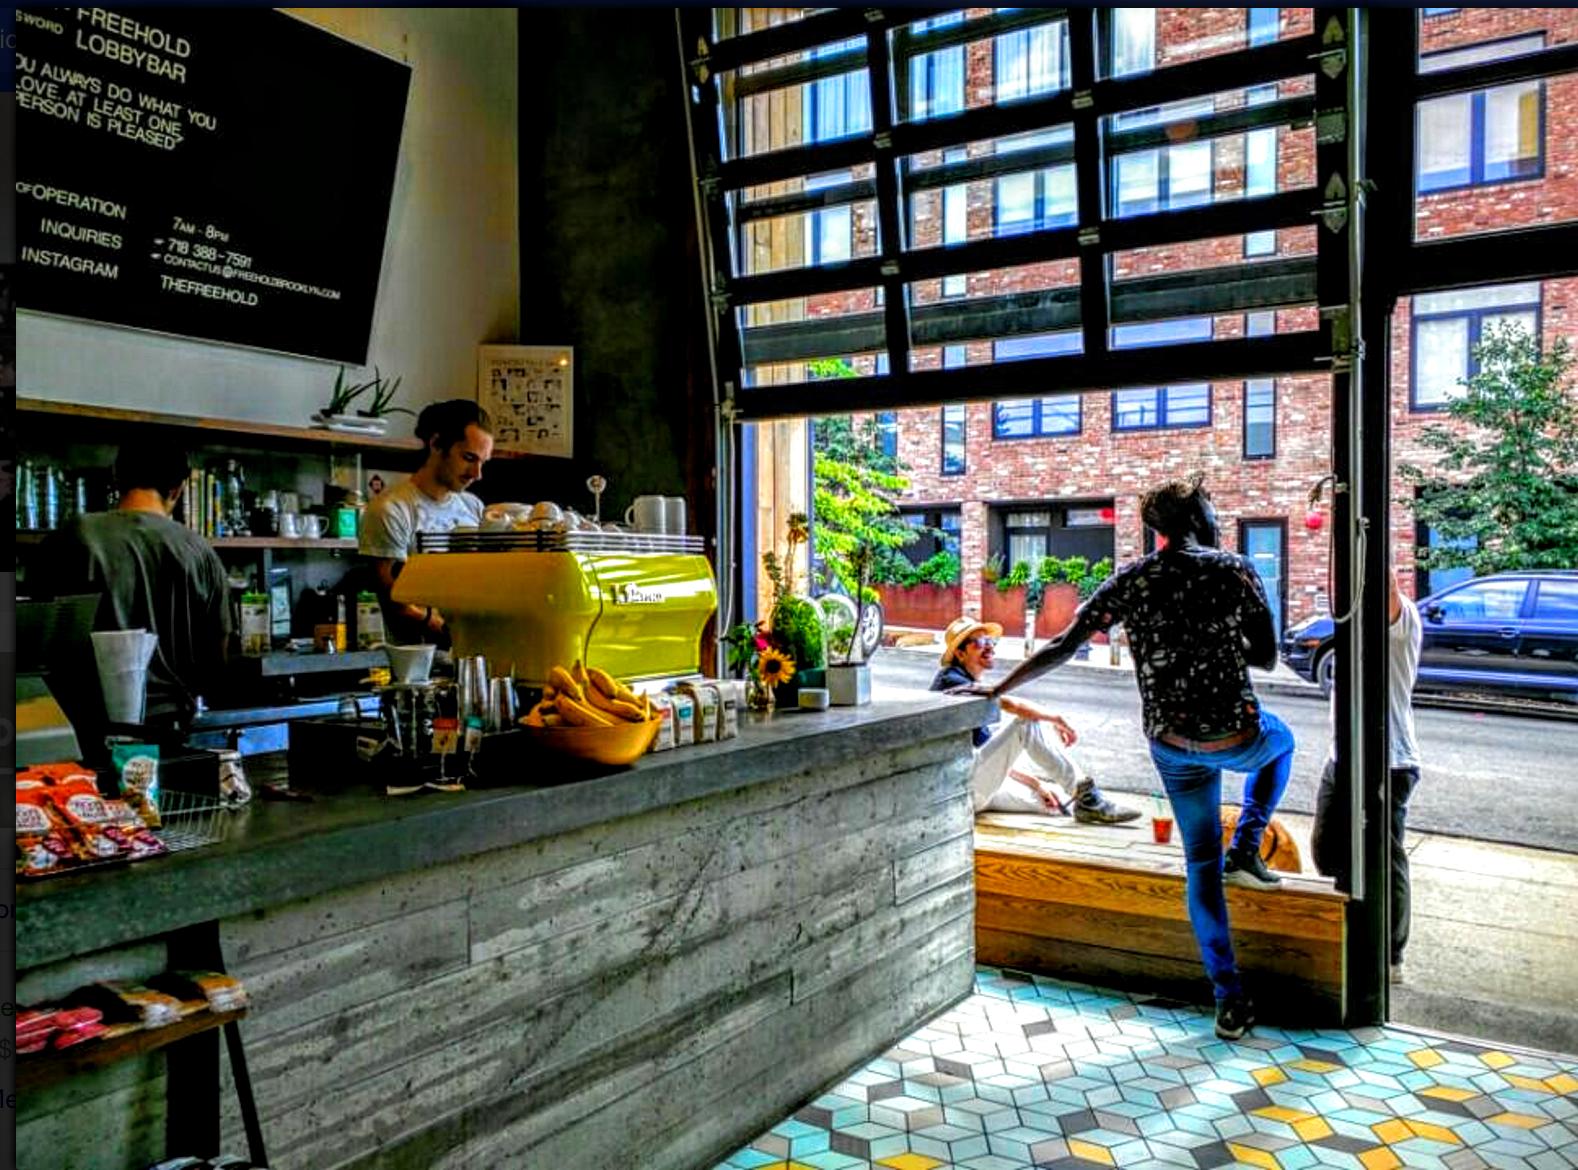 Glass_Garage_Door_Brooklyn_NY.png & Finest Doorman Blog | Loading Dock New Jersey - New York | brooklyn ...